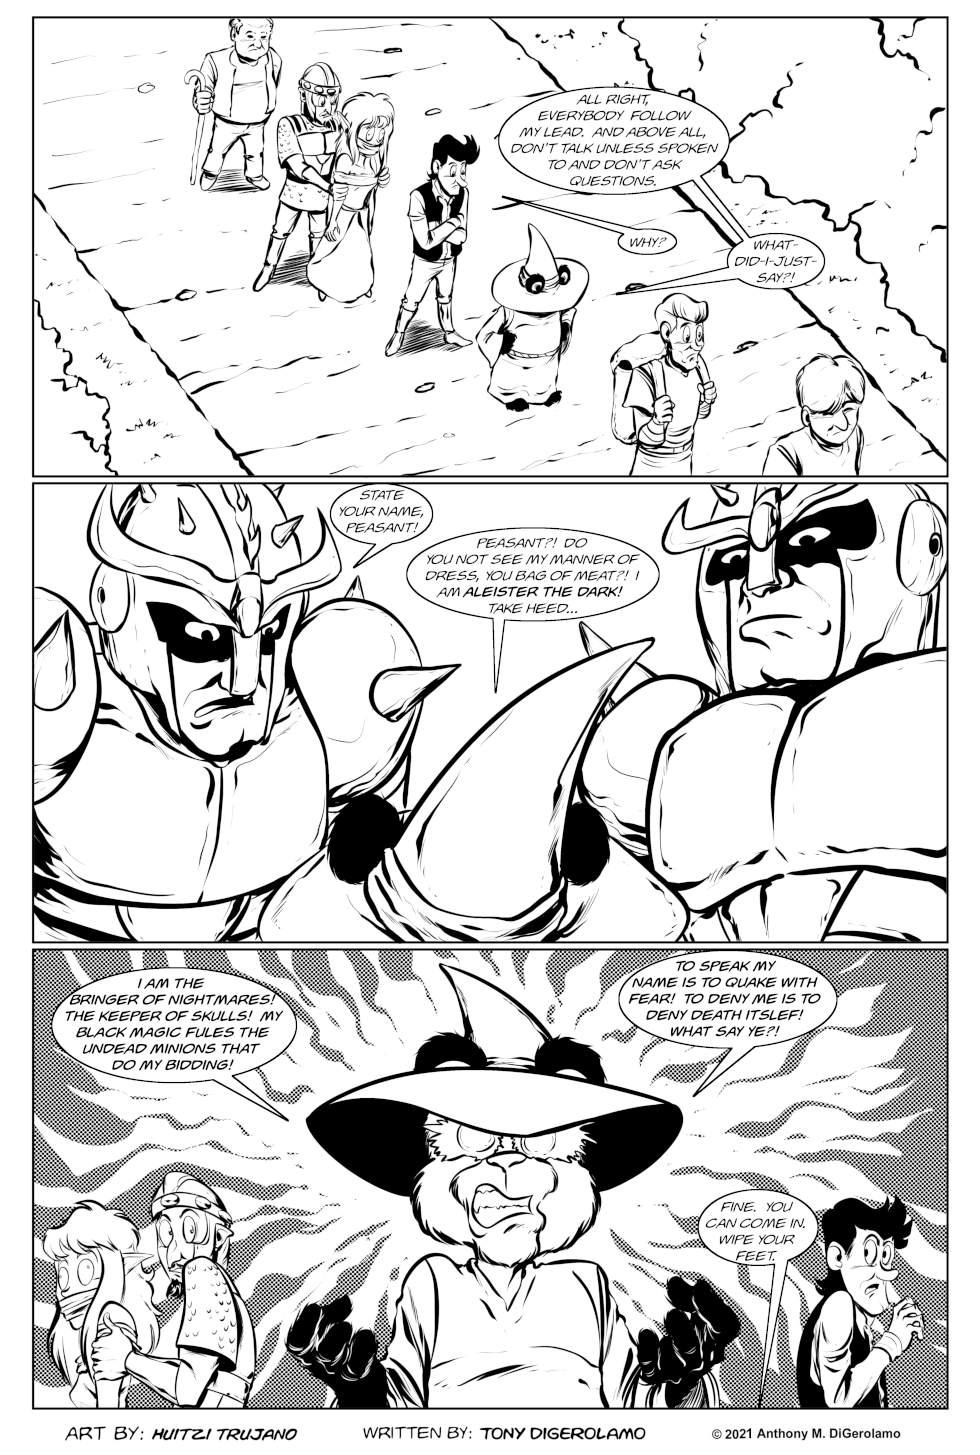 Pandamodium:  Entering the Crimson Duchy